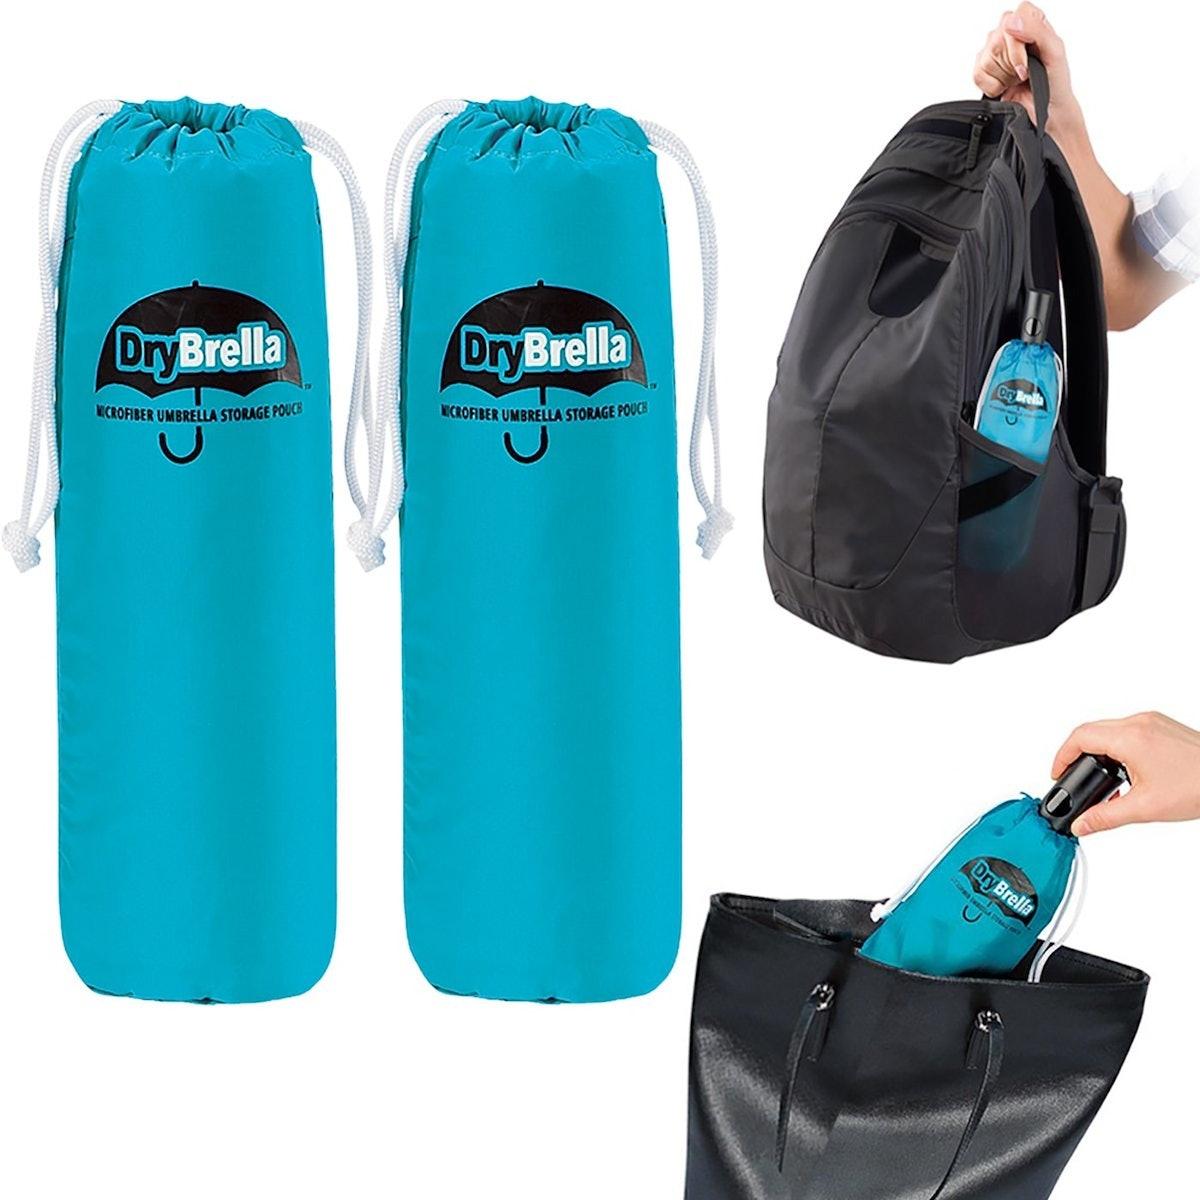 Drybella Microfiber Umbrella Storage Pouch (2 Pack)